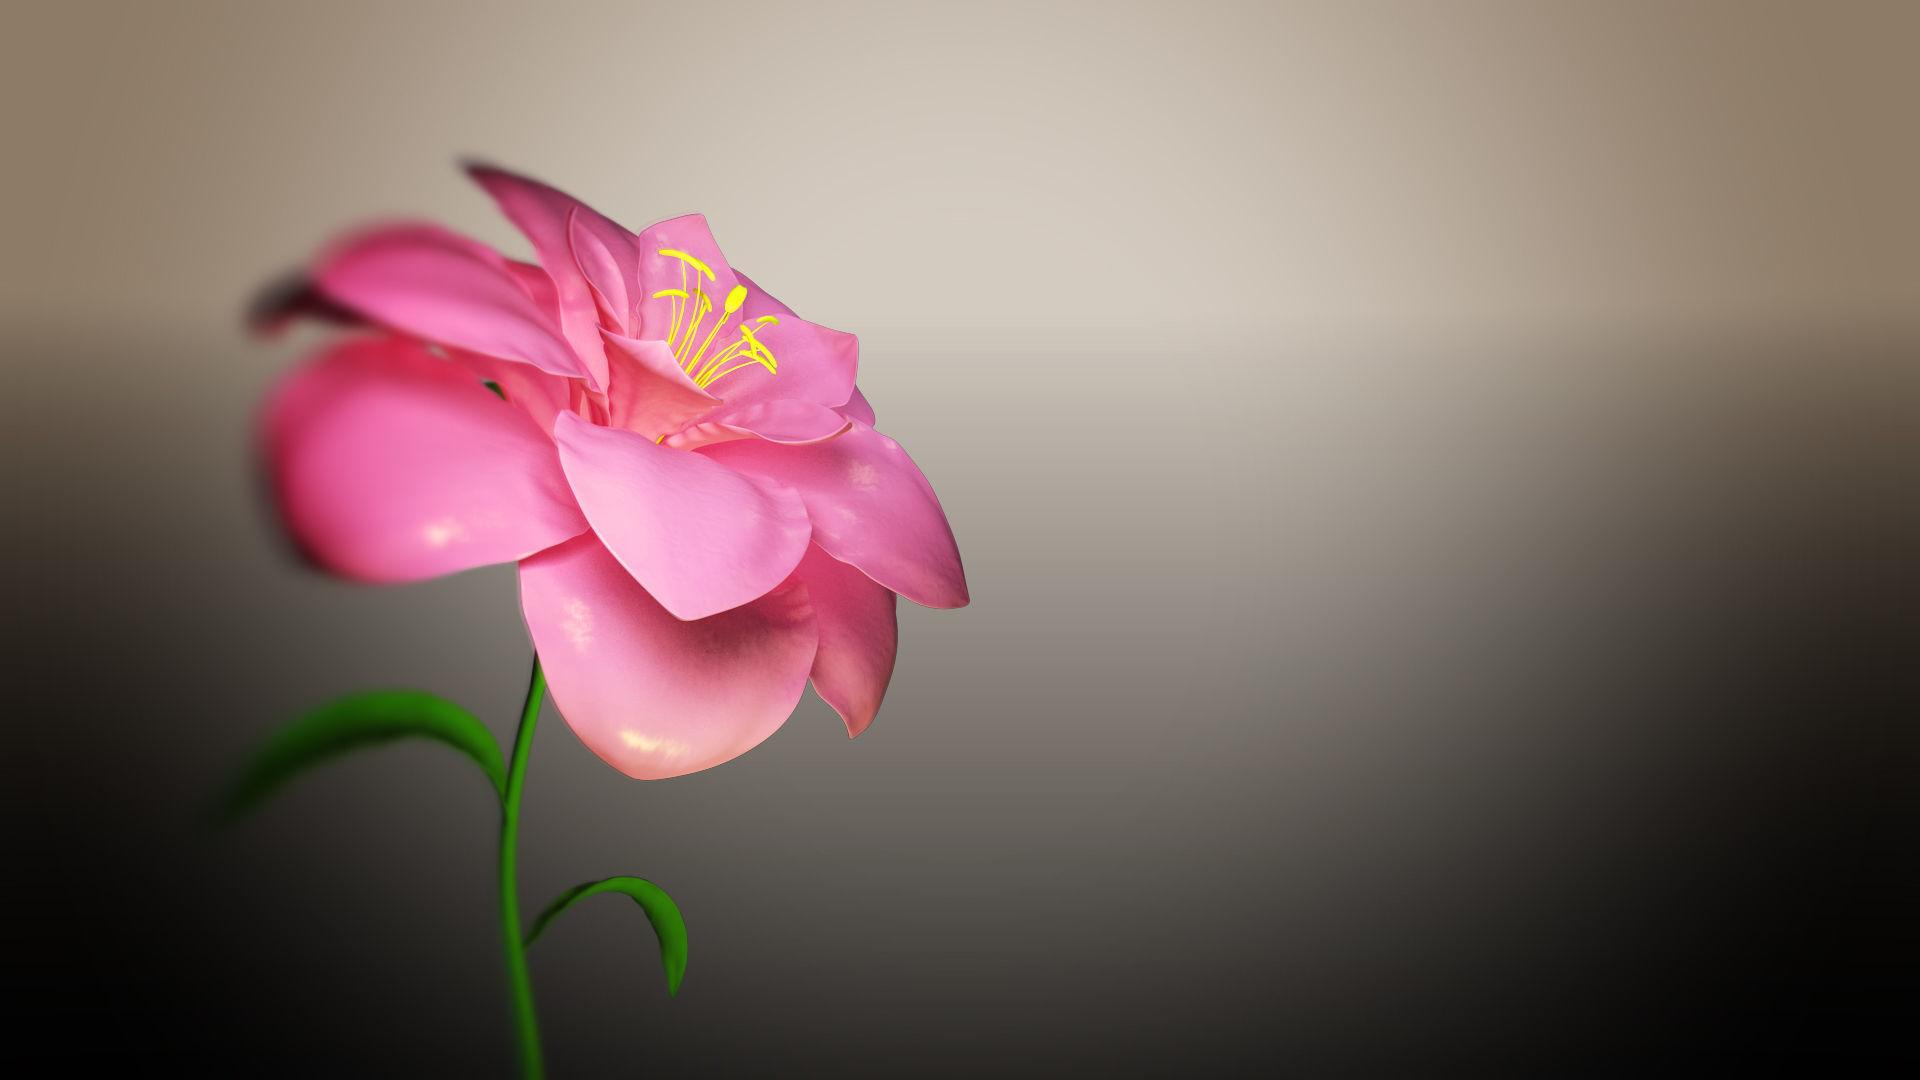 Animated Flower Blooming Flower